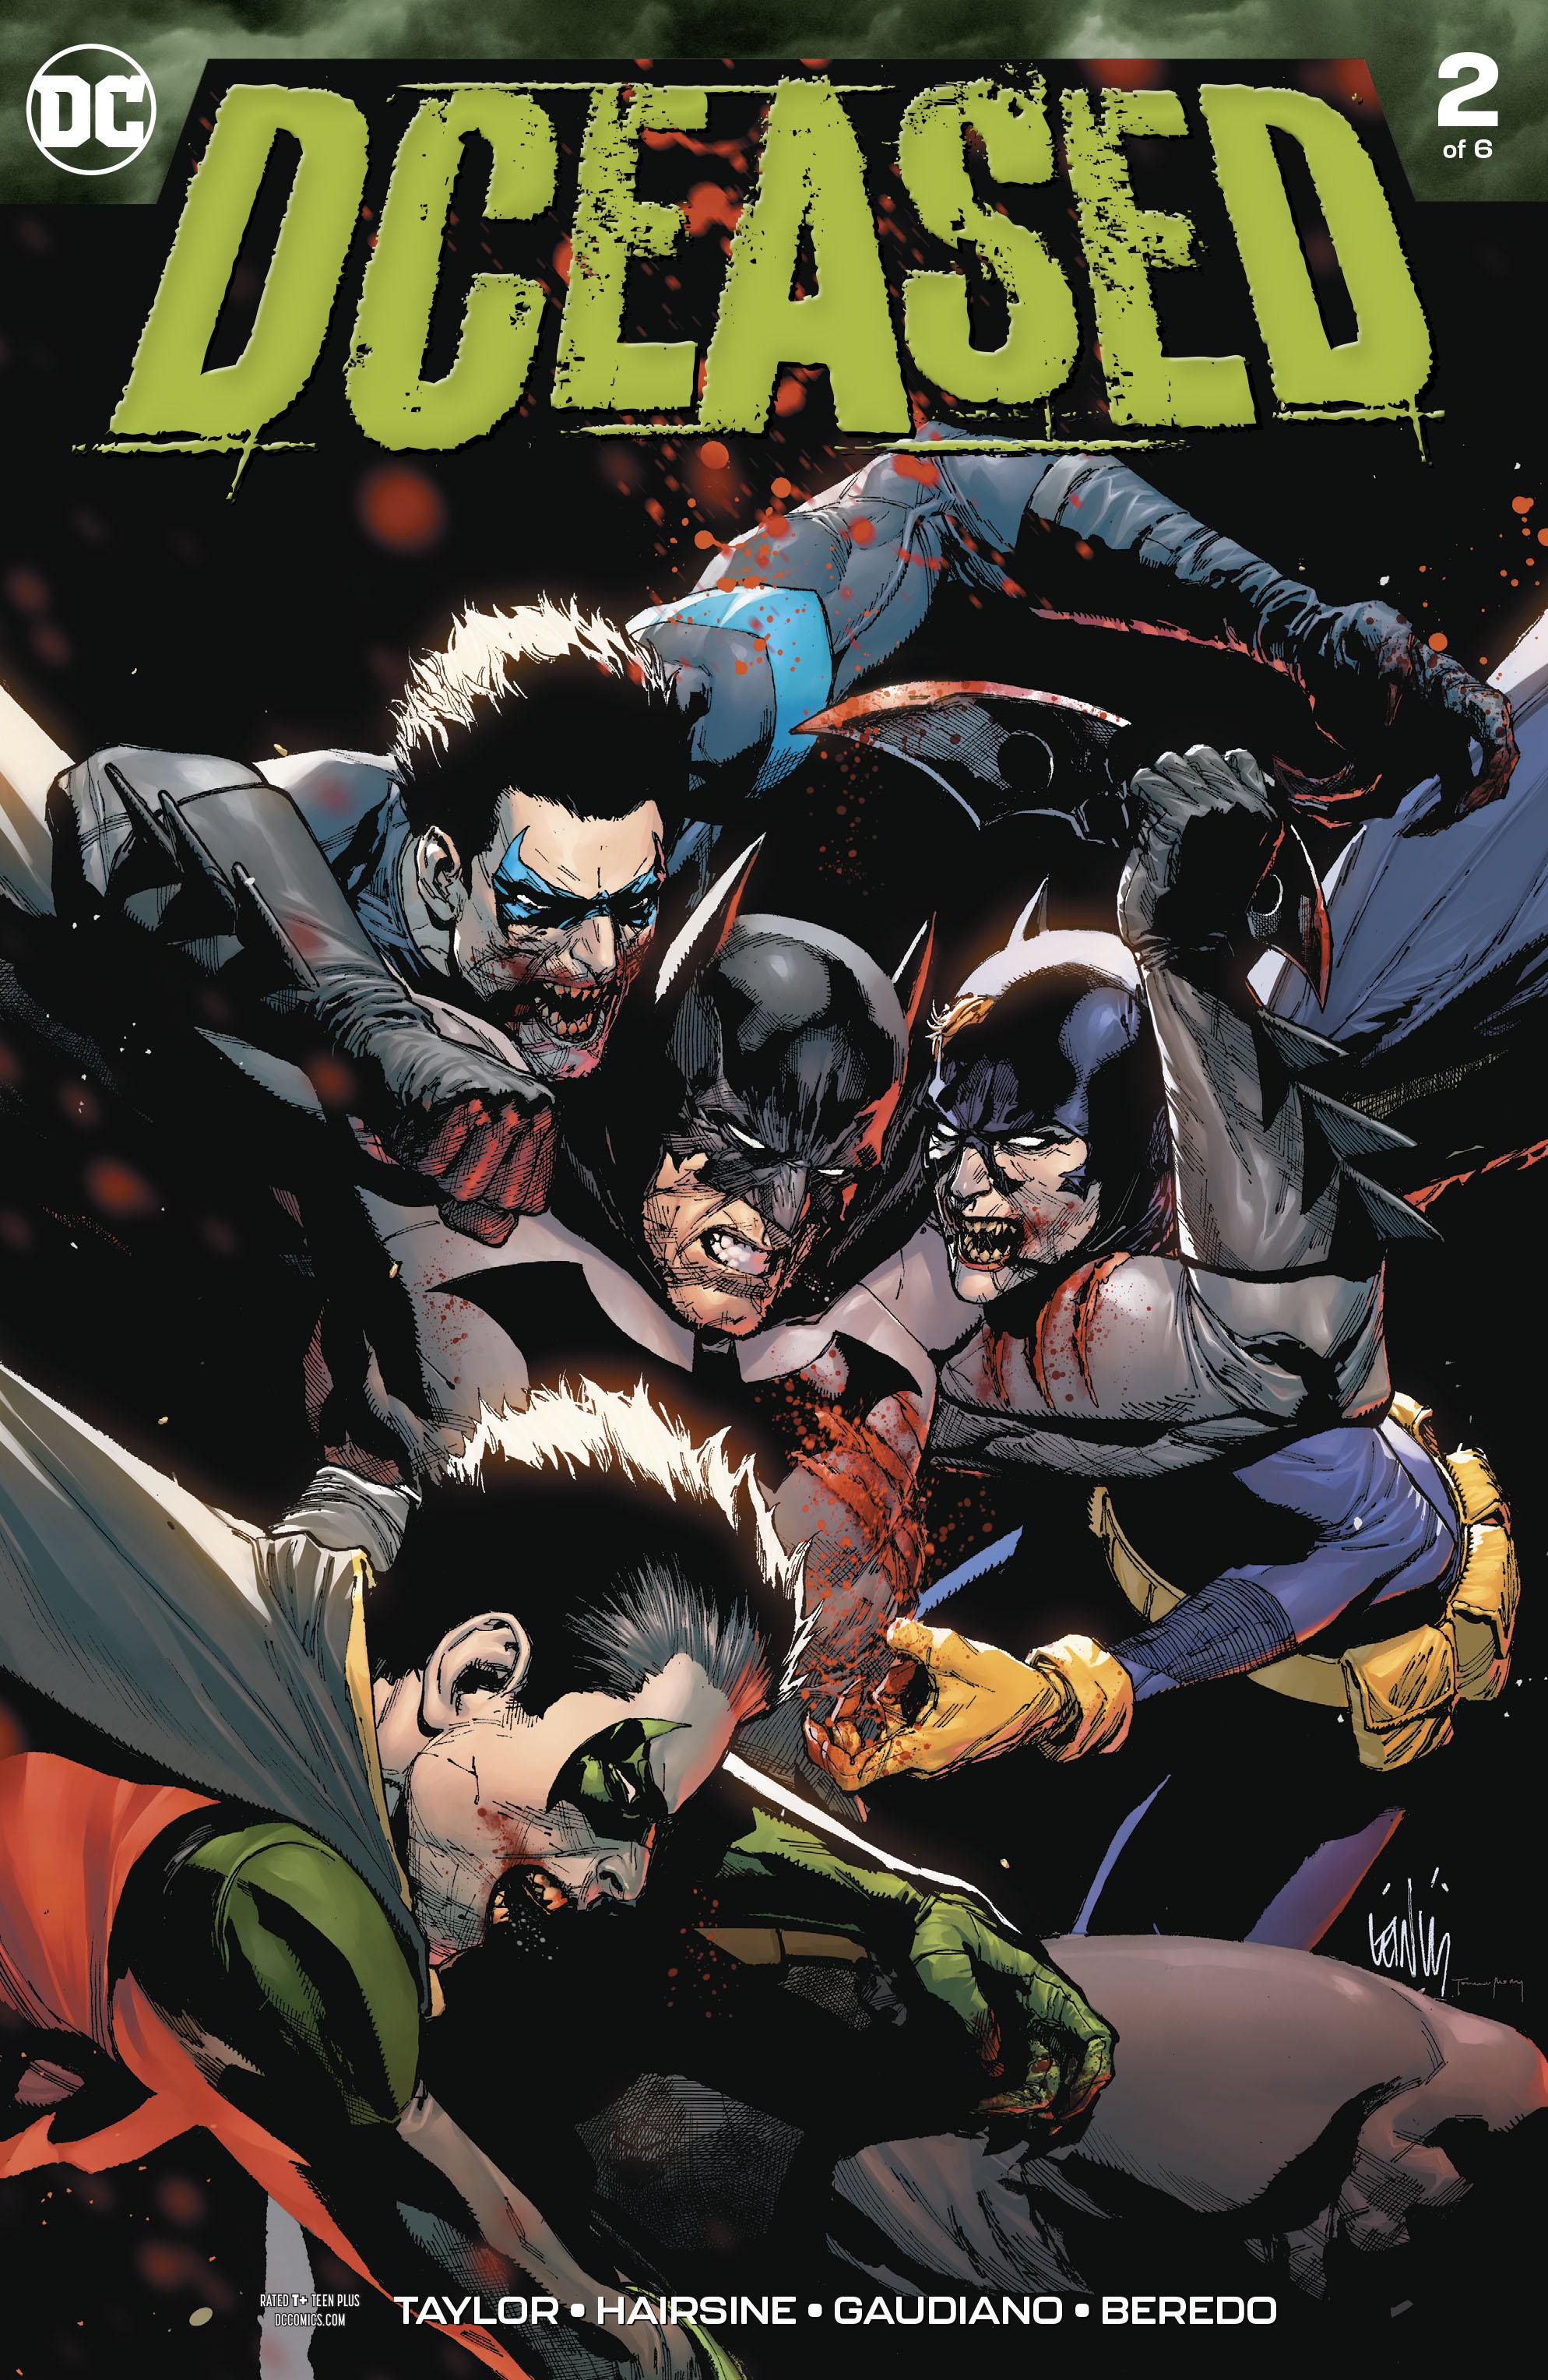 Image - Catman 0001.jpg | DC Database | Fandom powered by